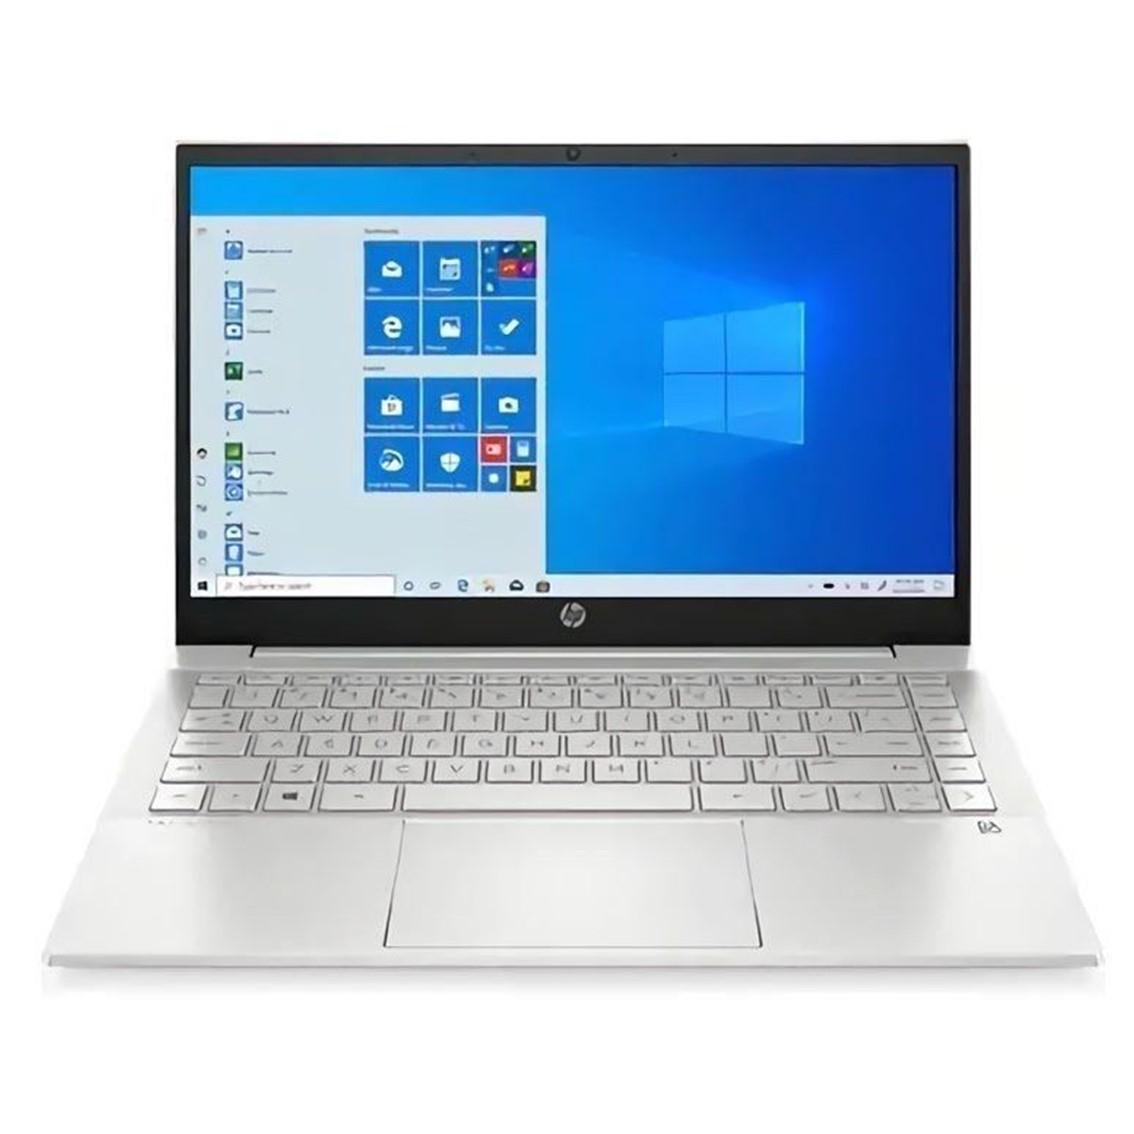 Portátil HP i5-1135g7 , con ssd de 512GB